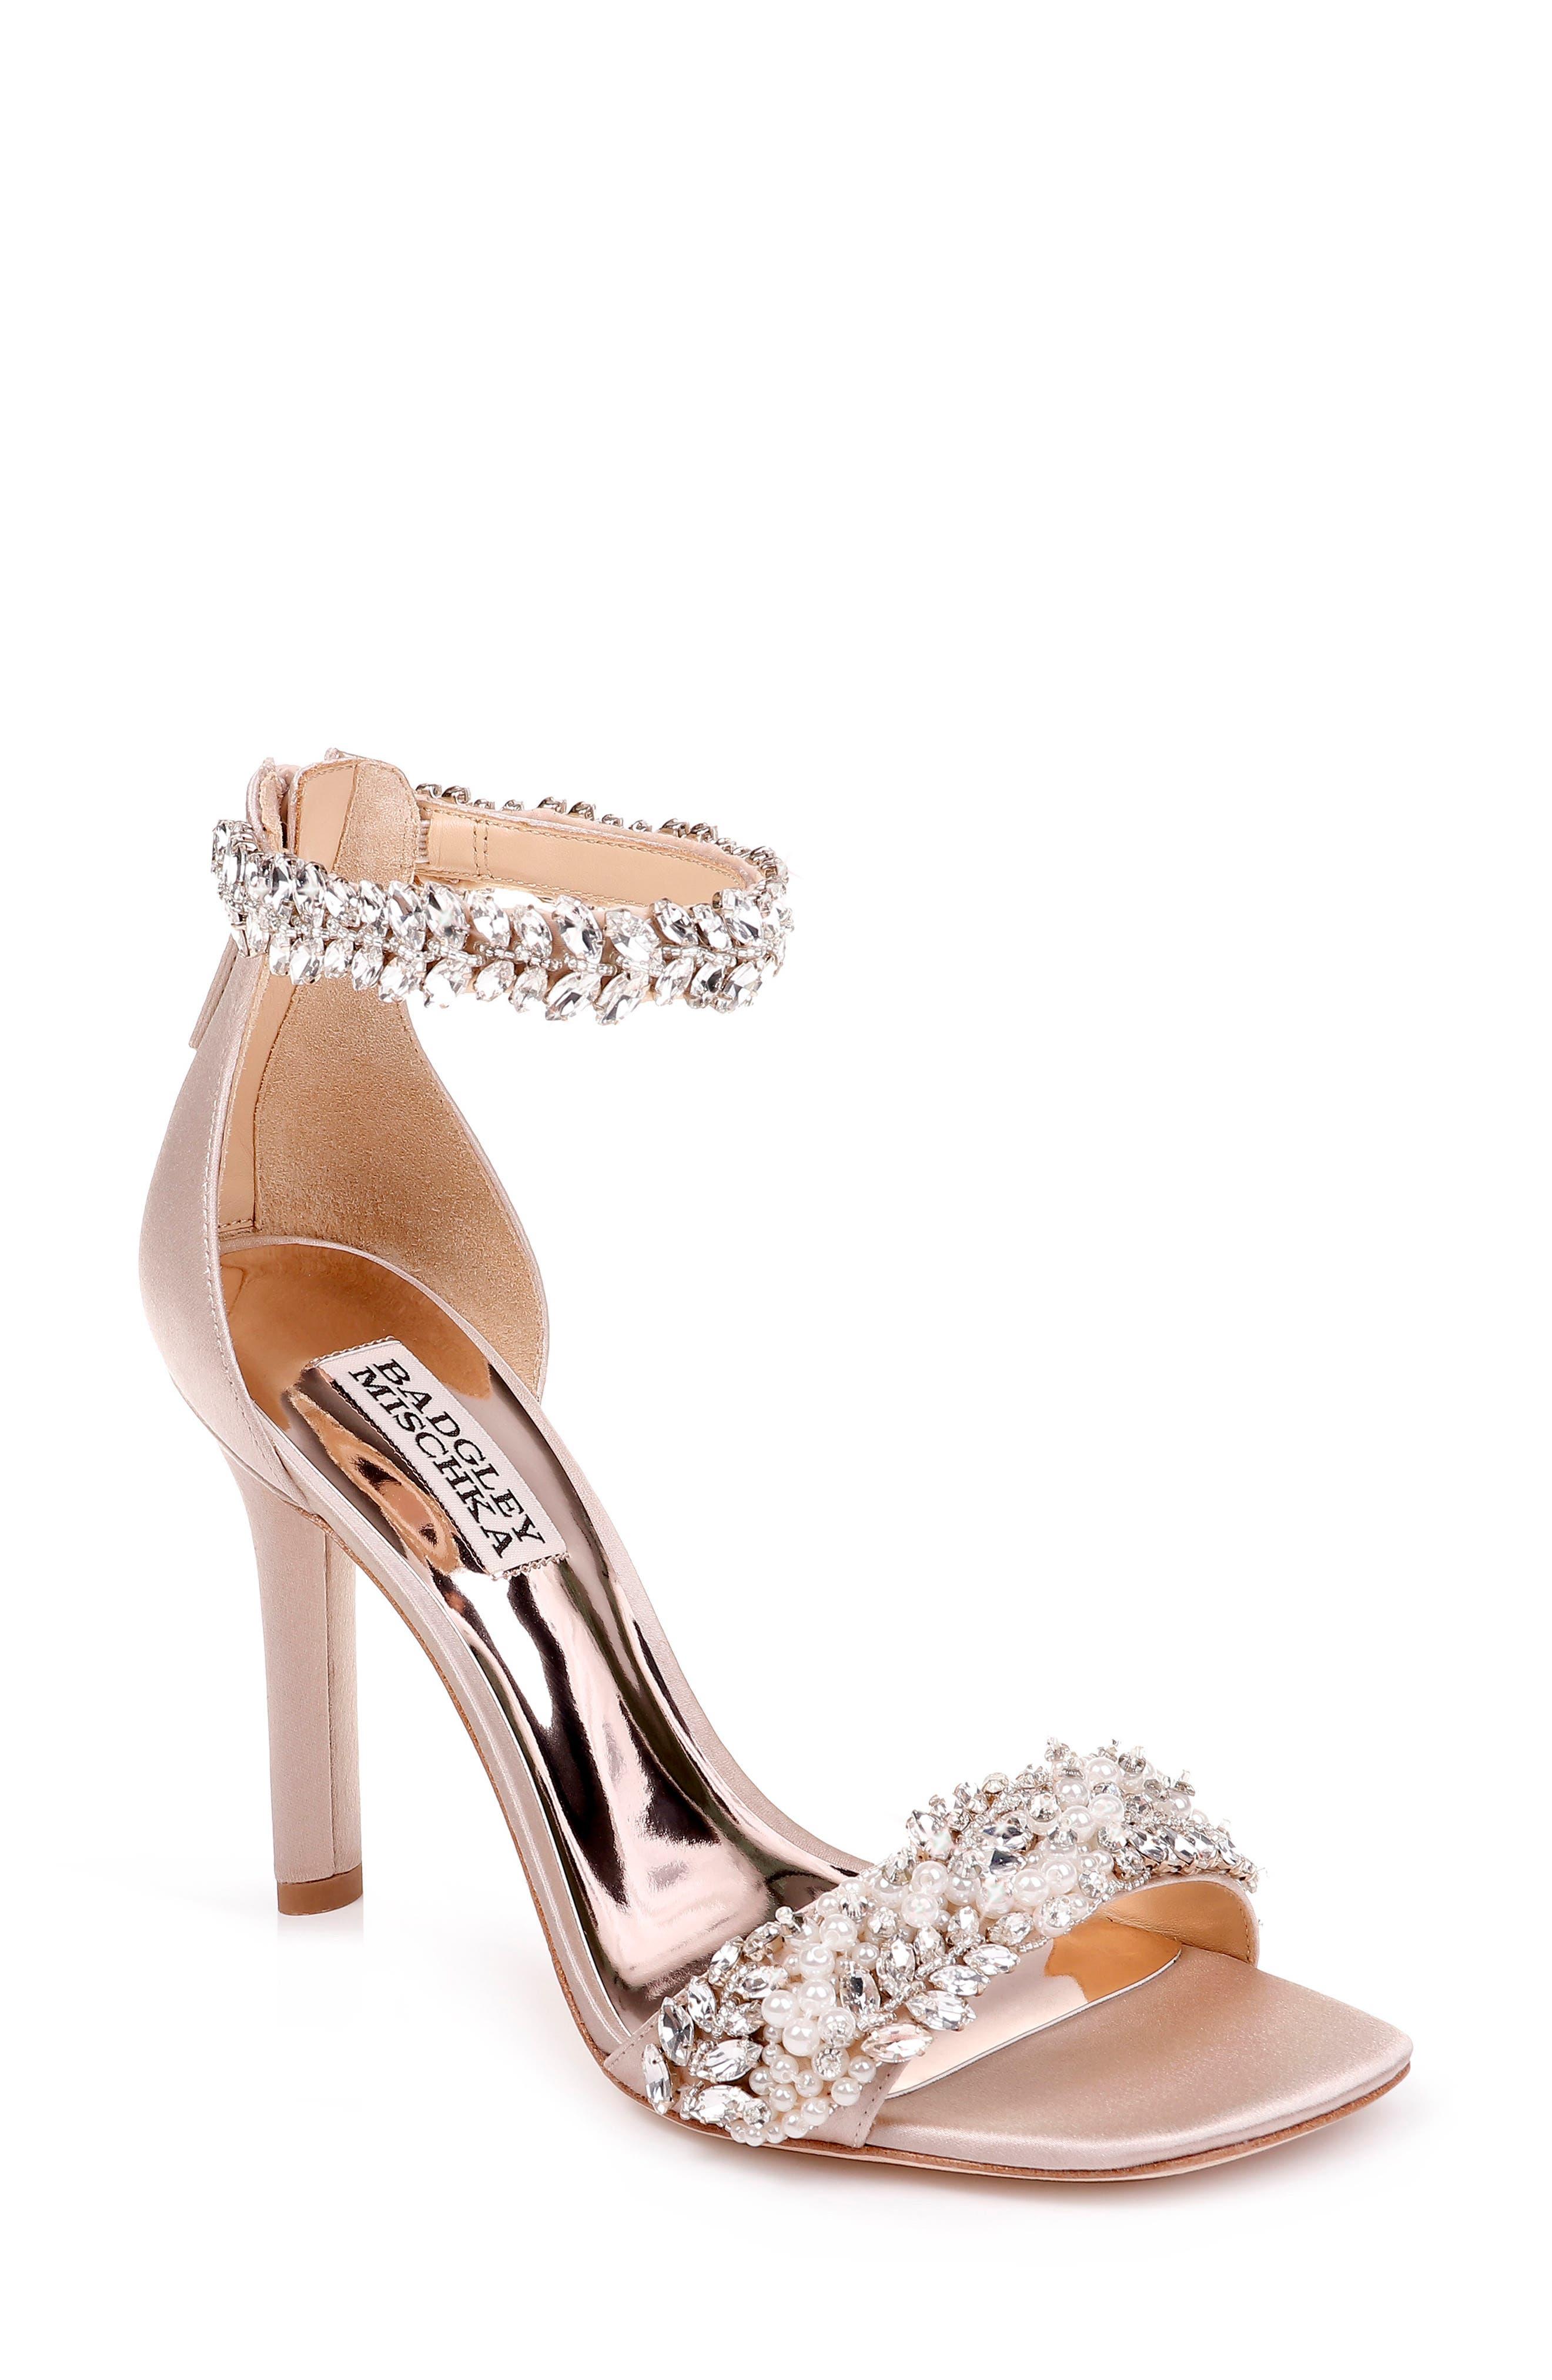 Fiorenza Embellished Satin Ankle-Wrap Sandals in Beige Satin